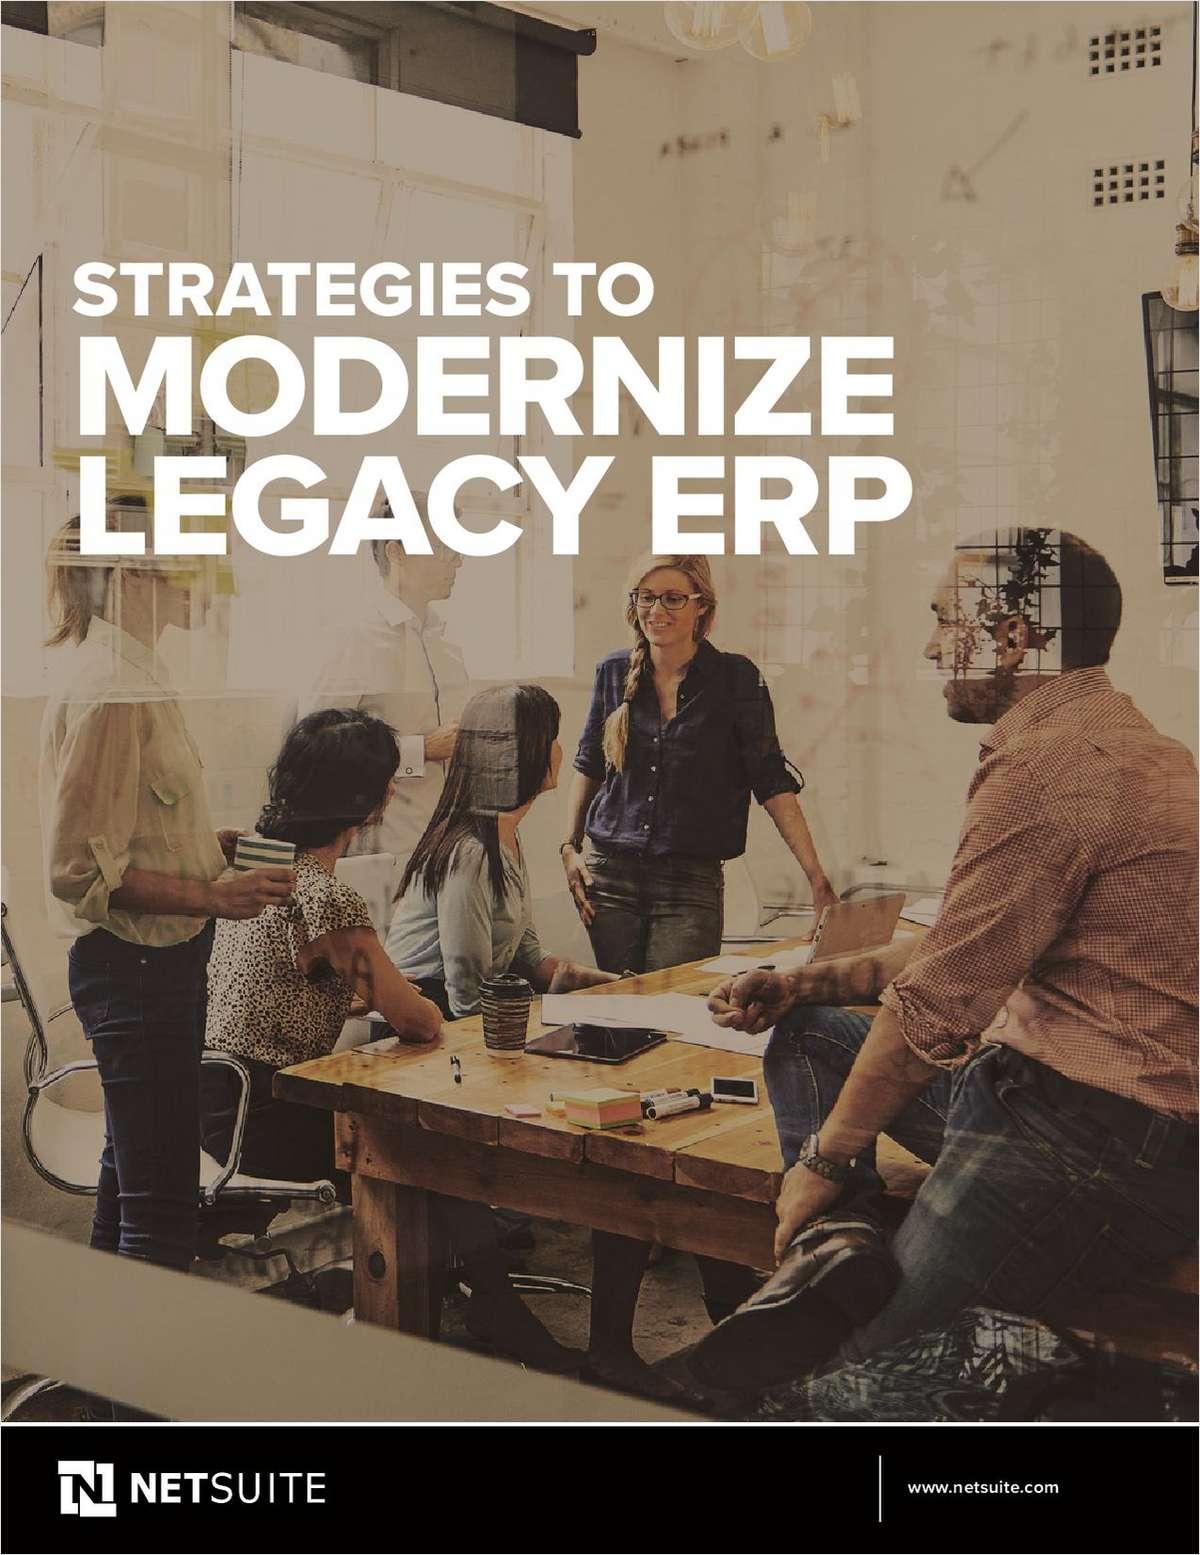 Strategies to Modernize Legacy ERP